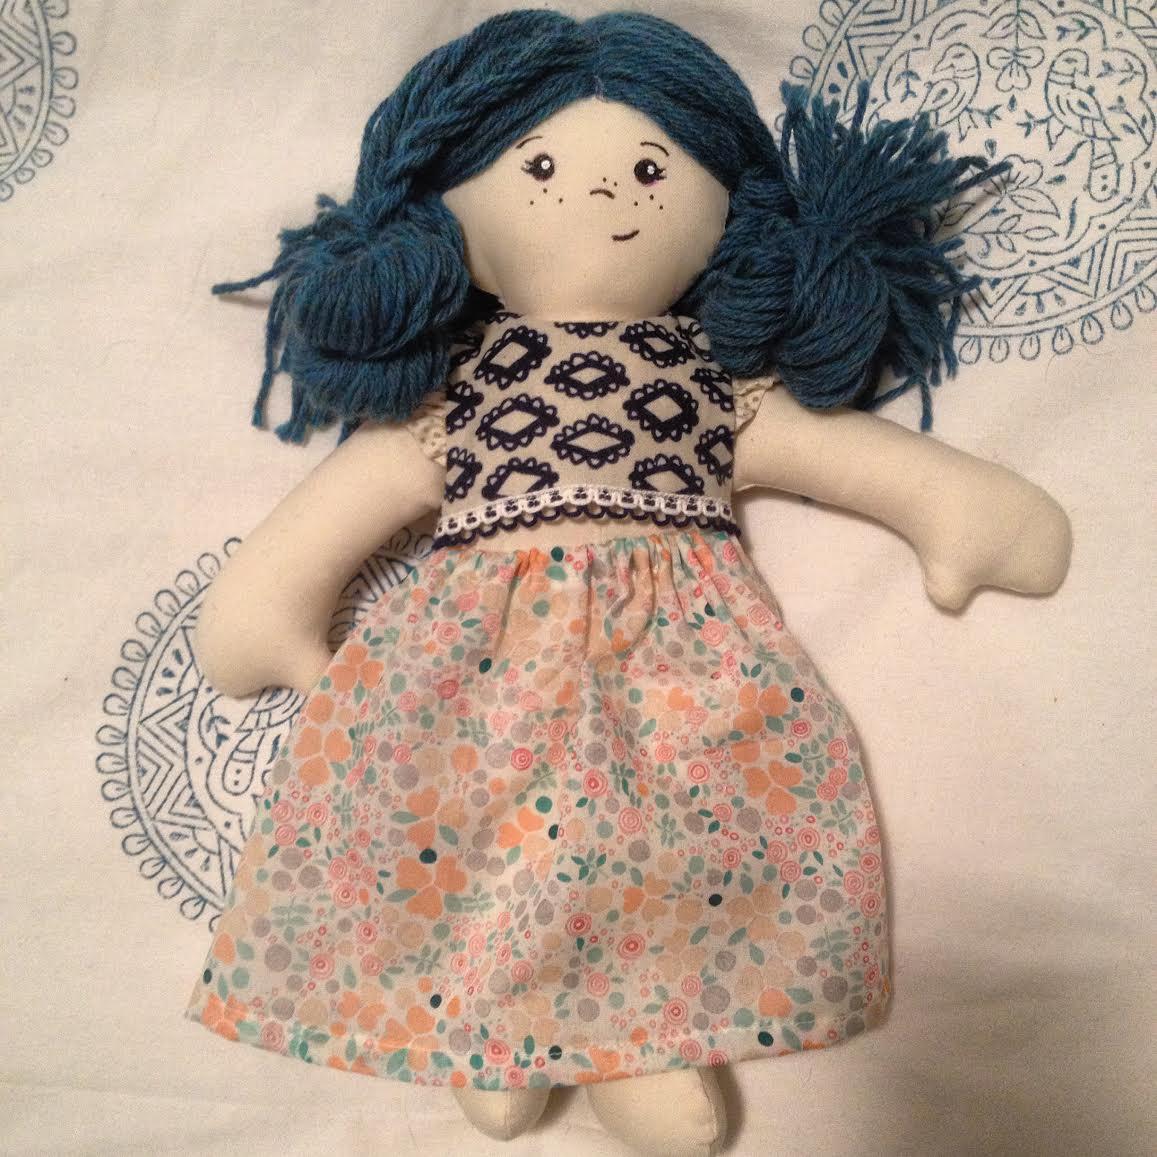 Bonmoth doll 1